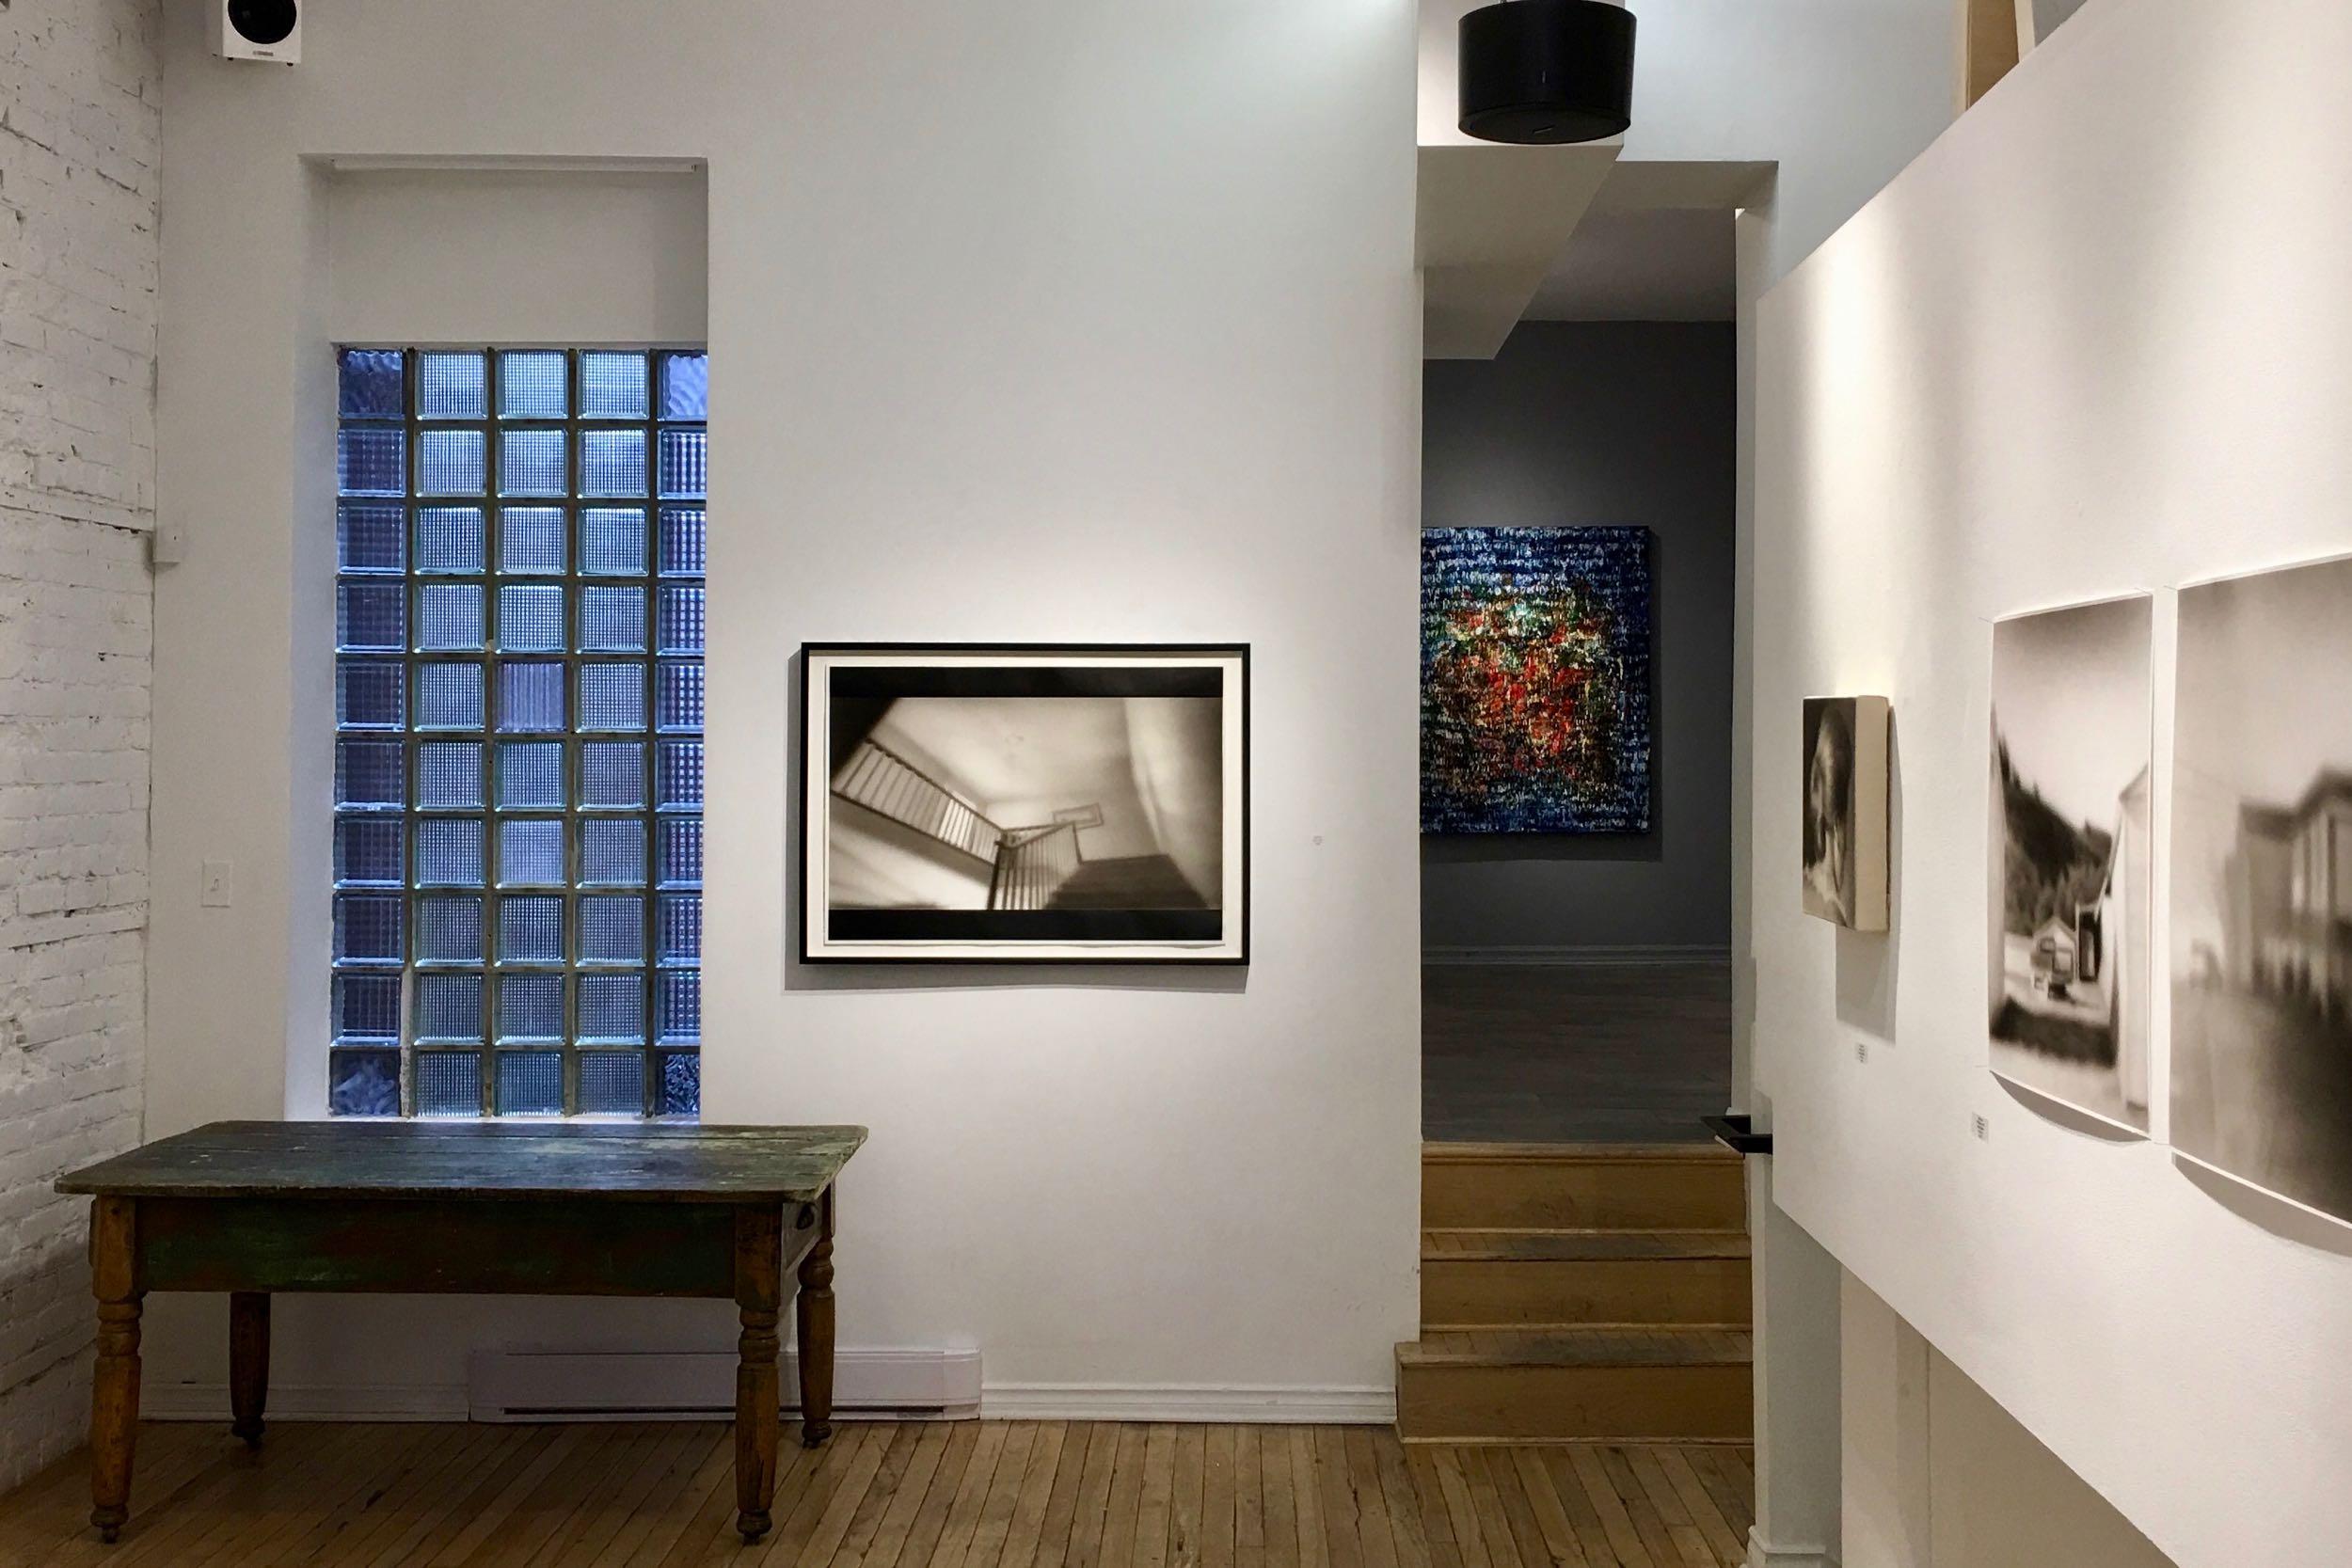 Magic Carpet Ride - 555 Anniversary Exhibition | Galerie Youn